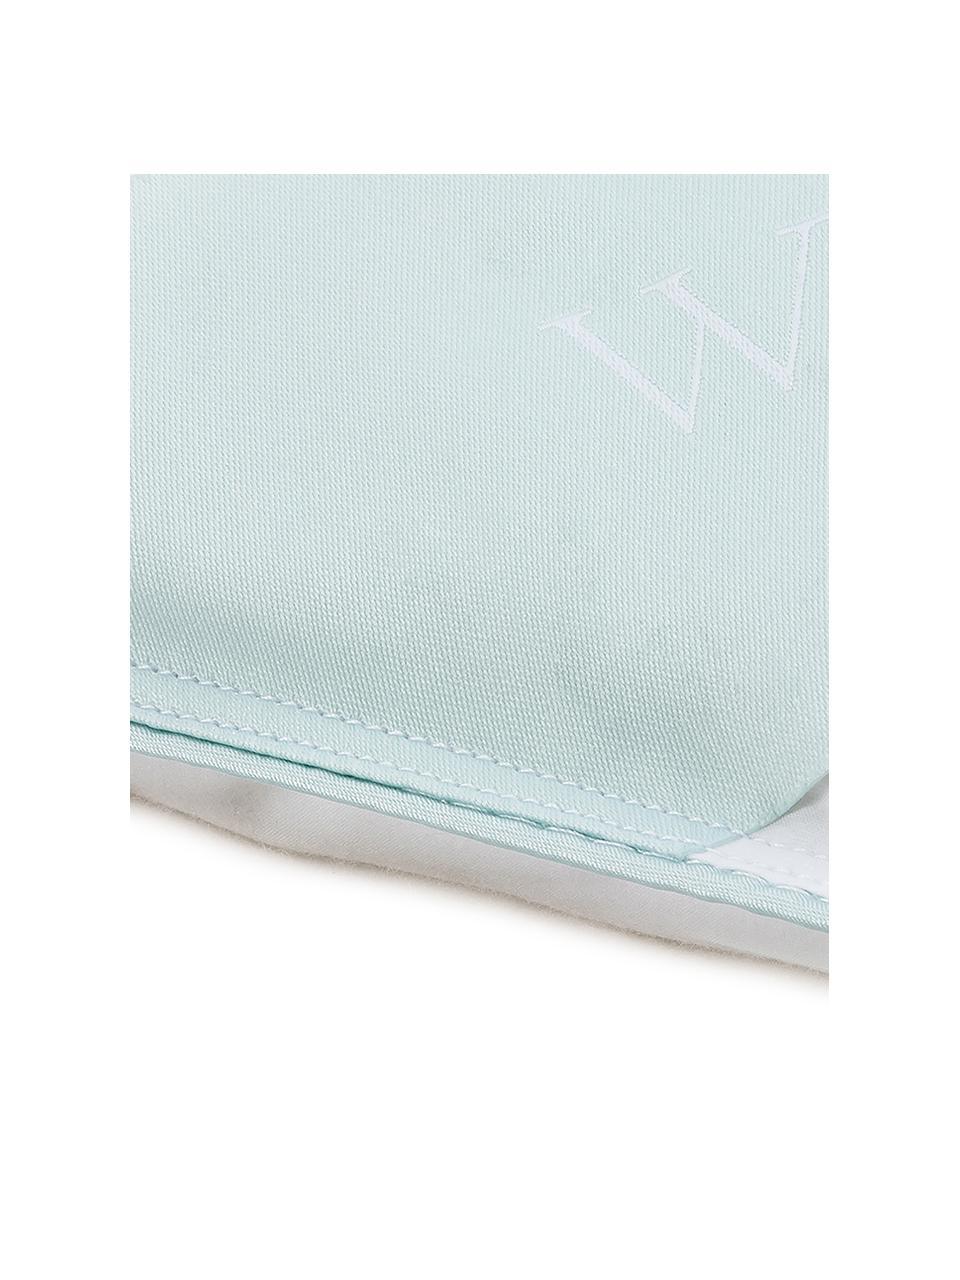 Zuiver donzen cassette-dekbed Premium, medium, Wit, 135 x 200 cm